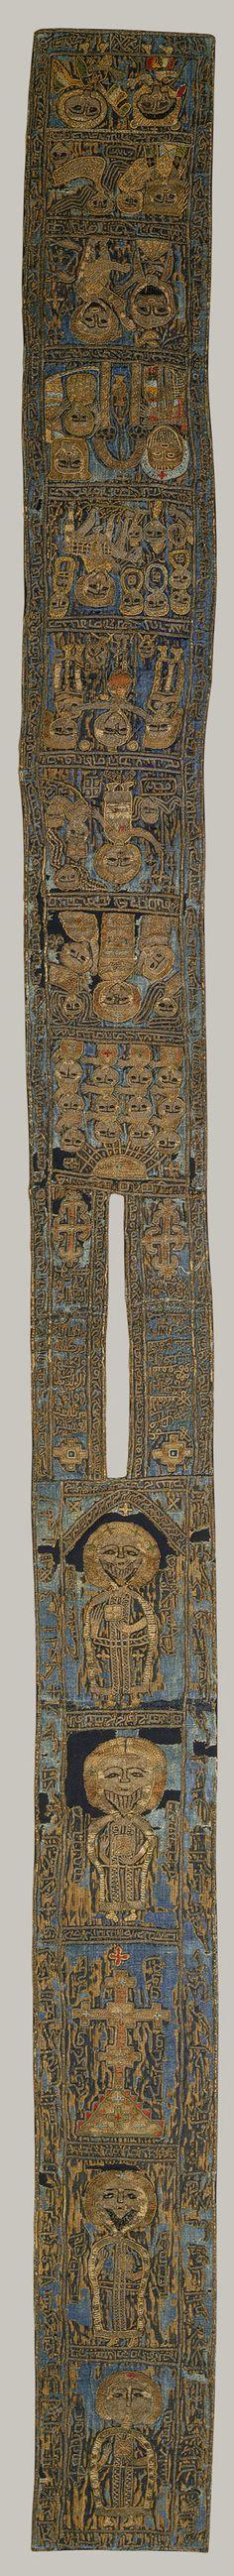 Byzantine Art under Islam | Thematic Essay | Heilbrunn Timeline of Art History | The Metropolitan Museum of Art